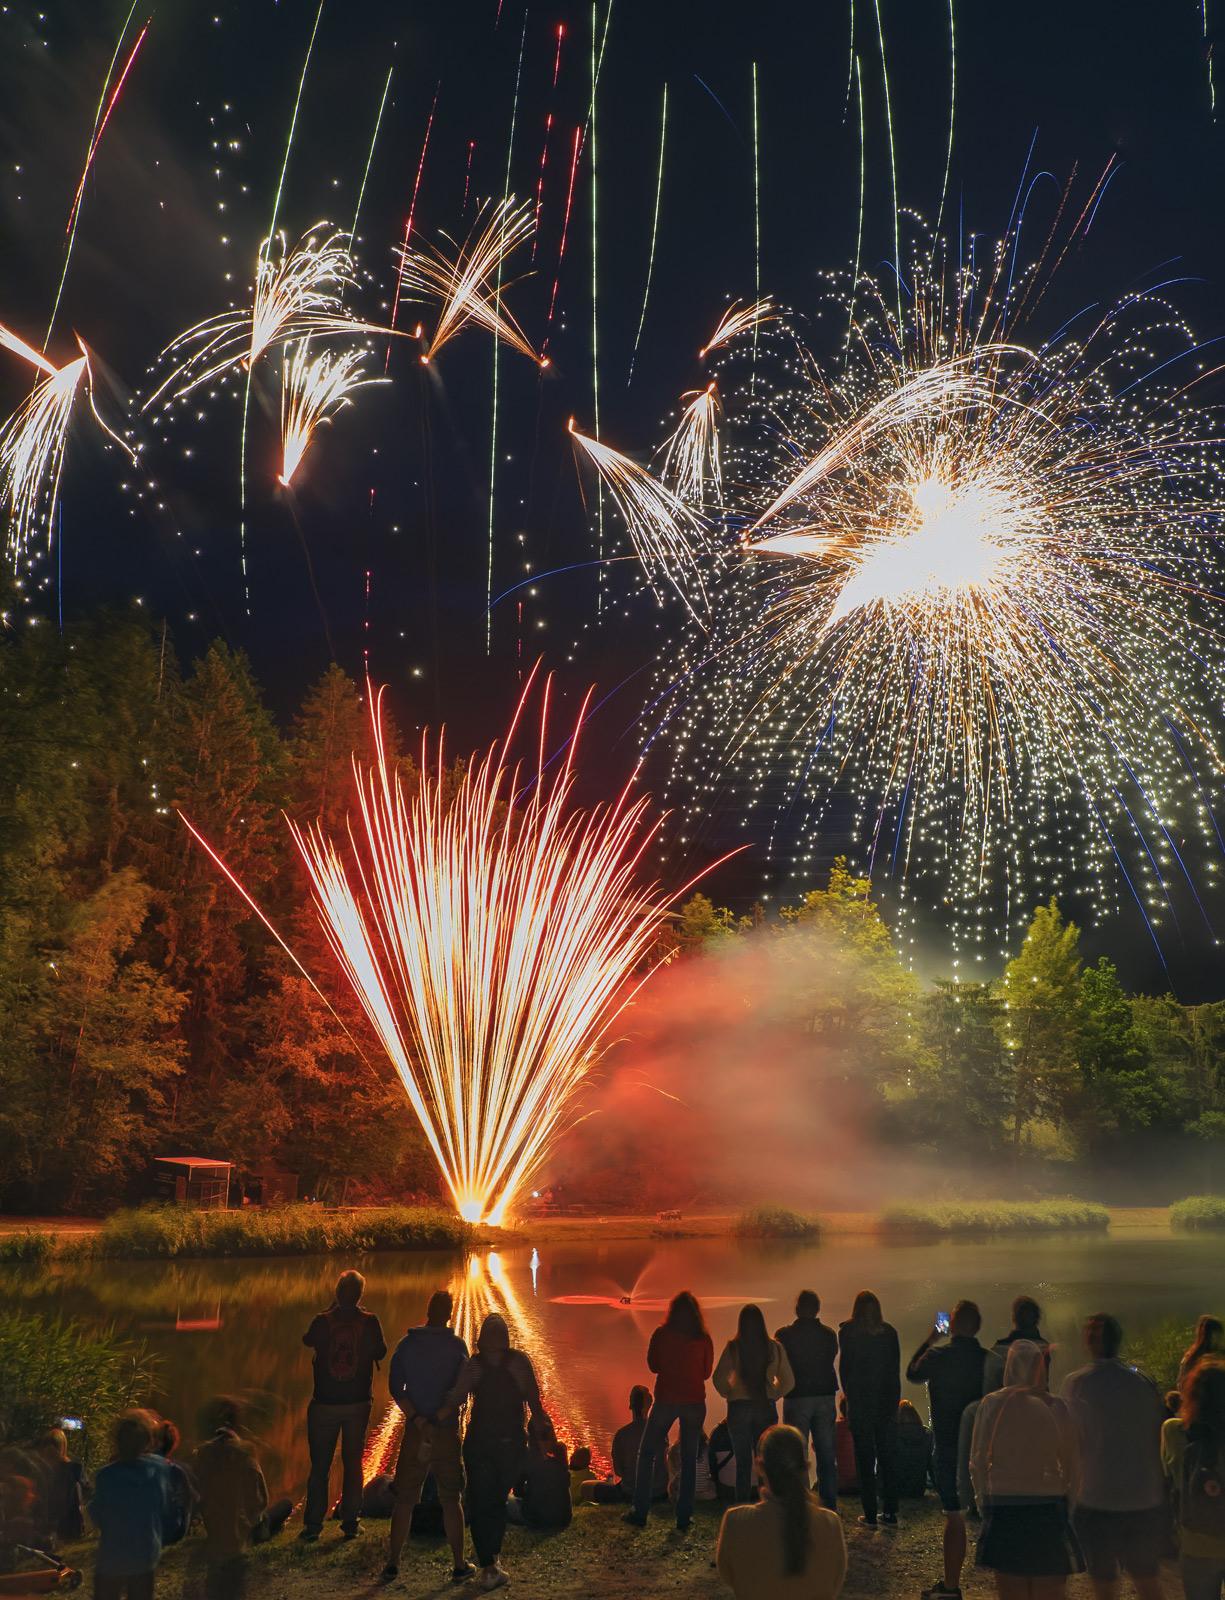 Fireworks 7, Les Houches, Chamonix, France, Bastille day, town, village, display, epic, fantastic, lake, darkness , photo